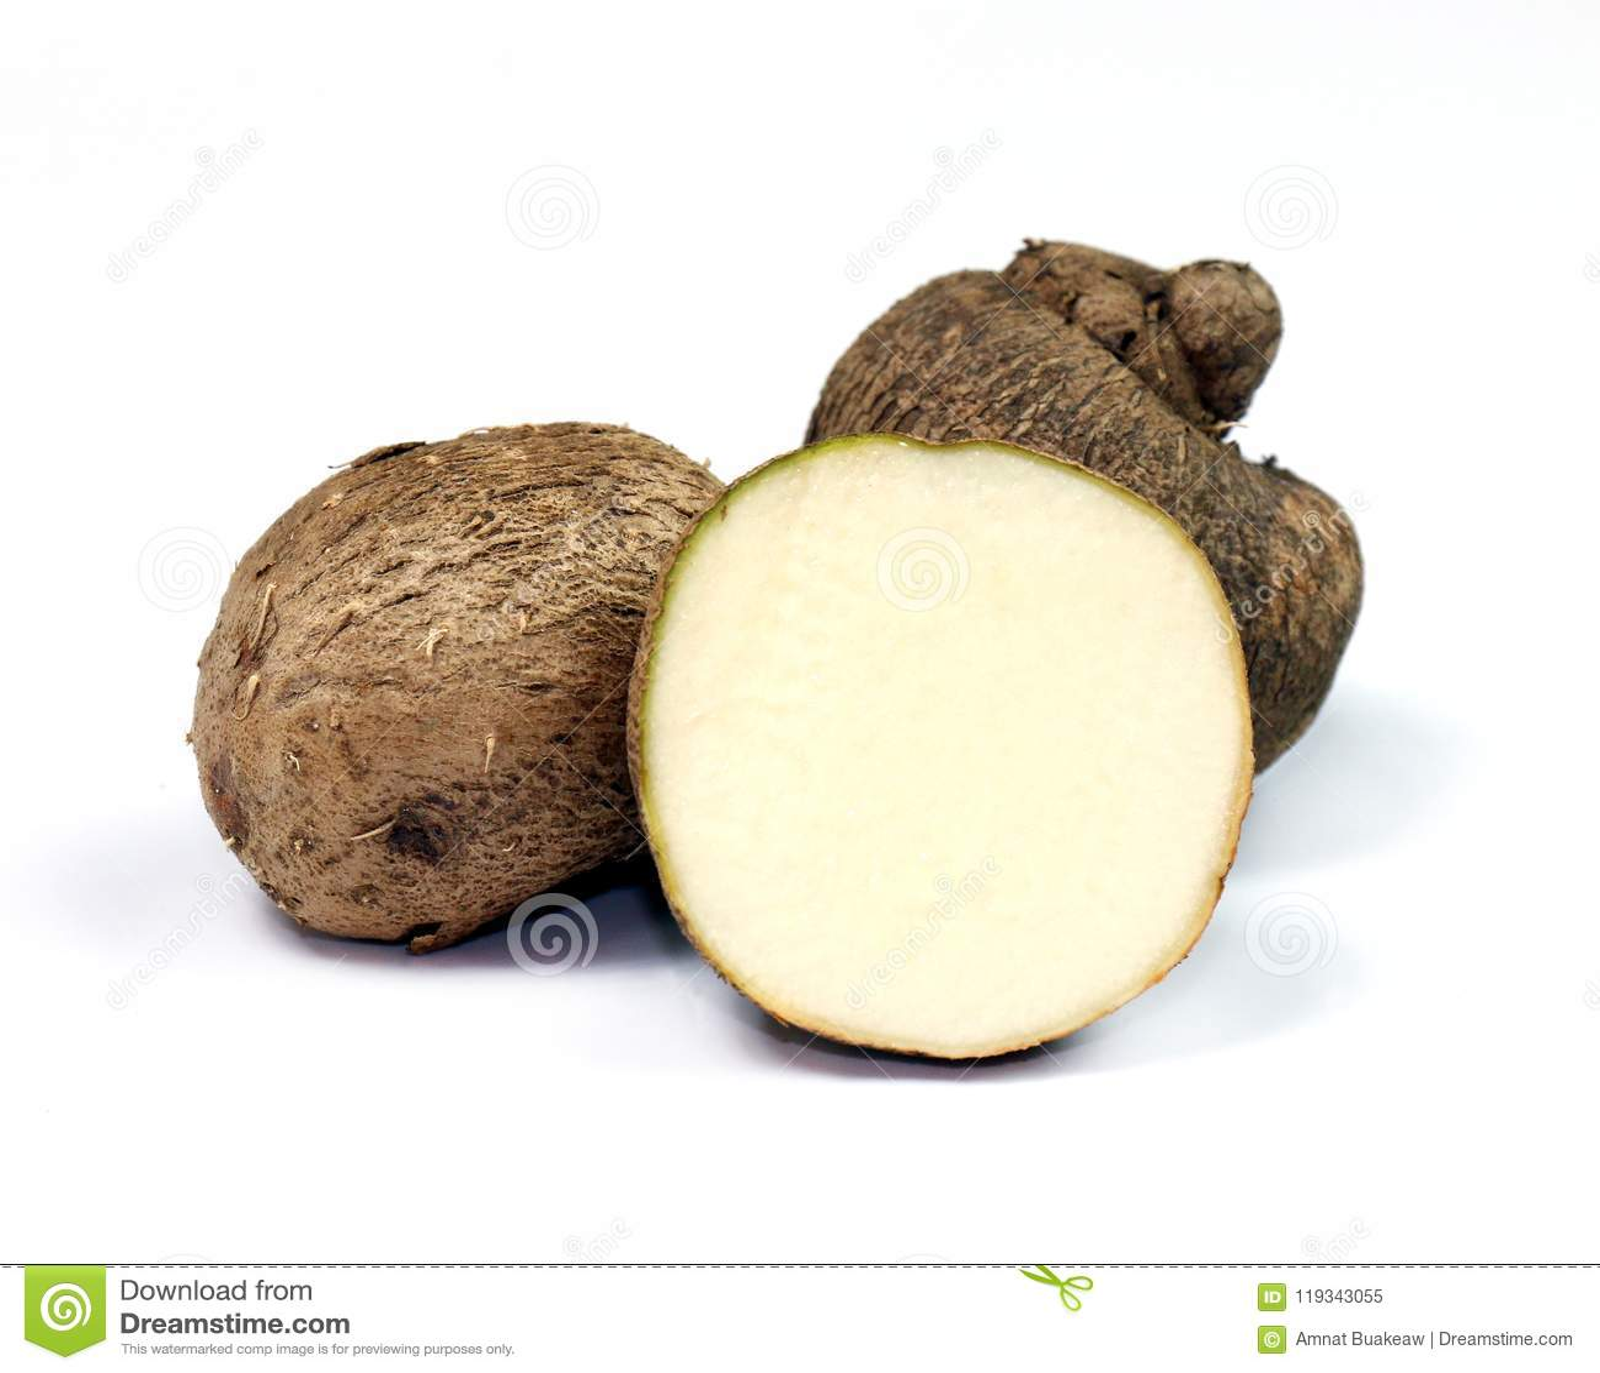 Dioscorea, Mun-Neb Thai word, Fresh Dioscorea tuck, Dioscorea slats root isolated on white background, Rubeola fotografie